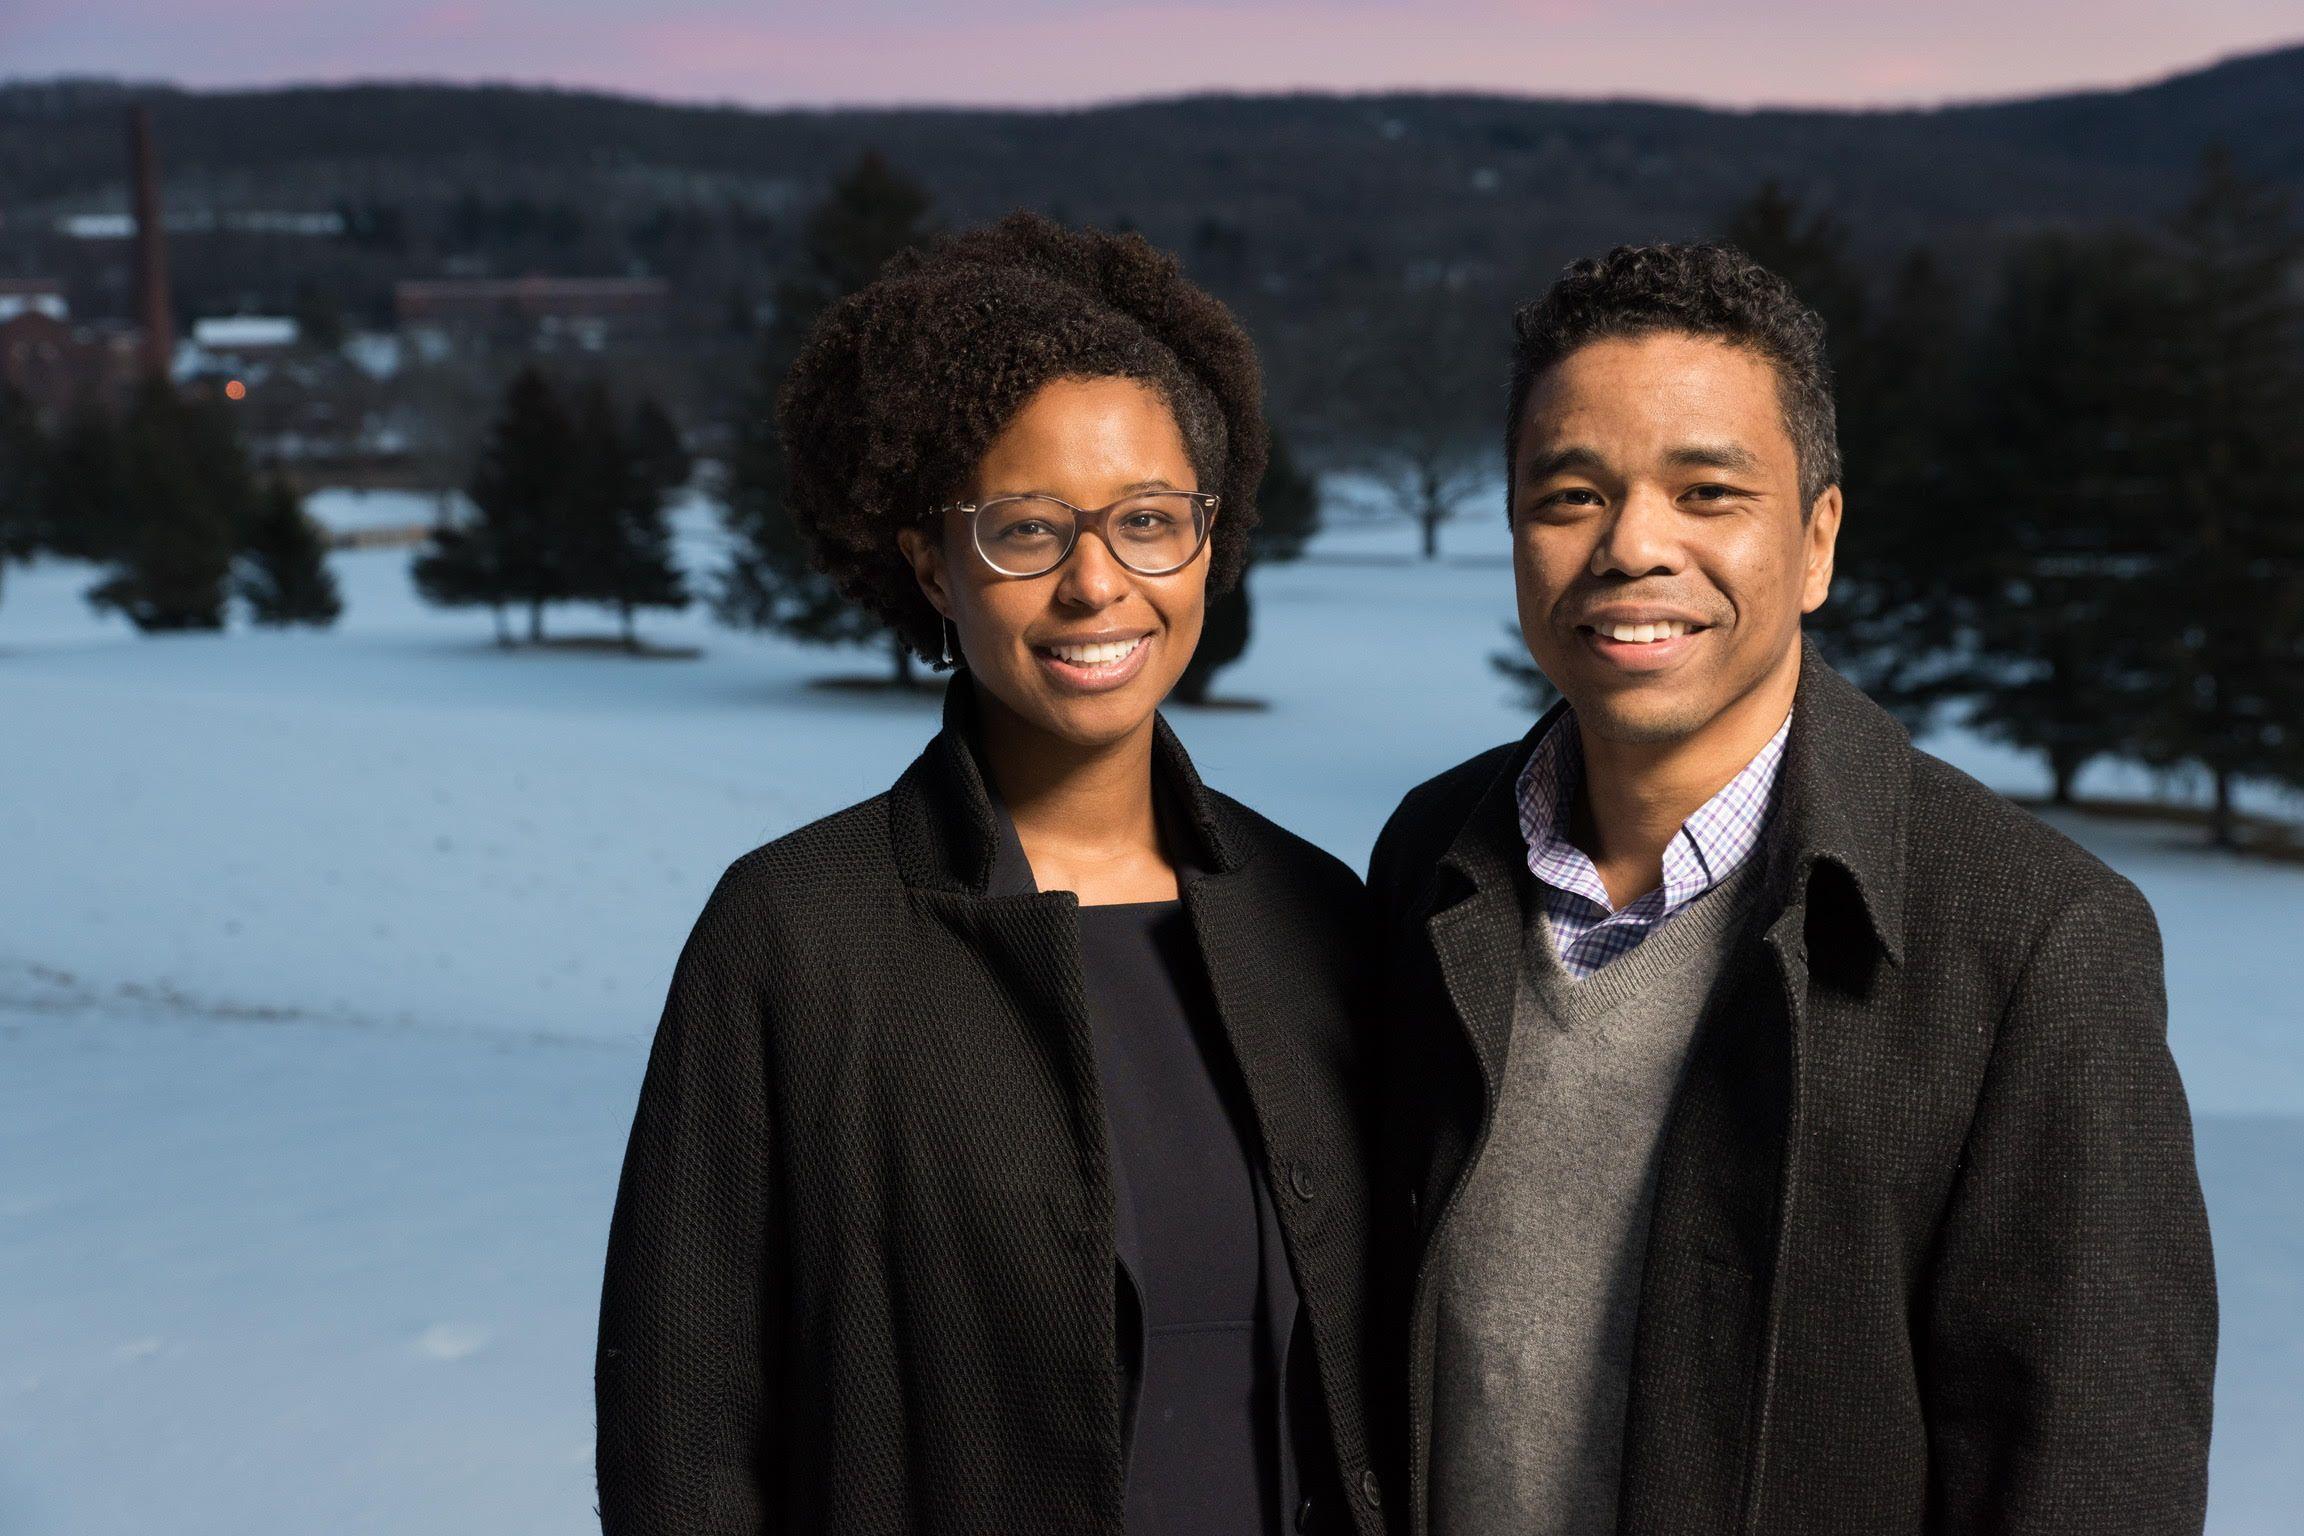 Tracy Davis and Johnathan Davis